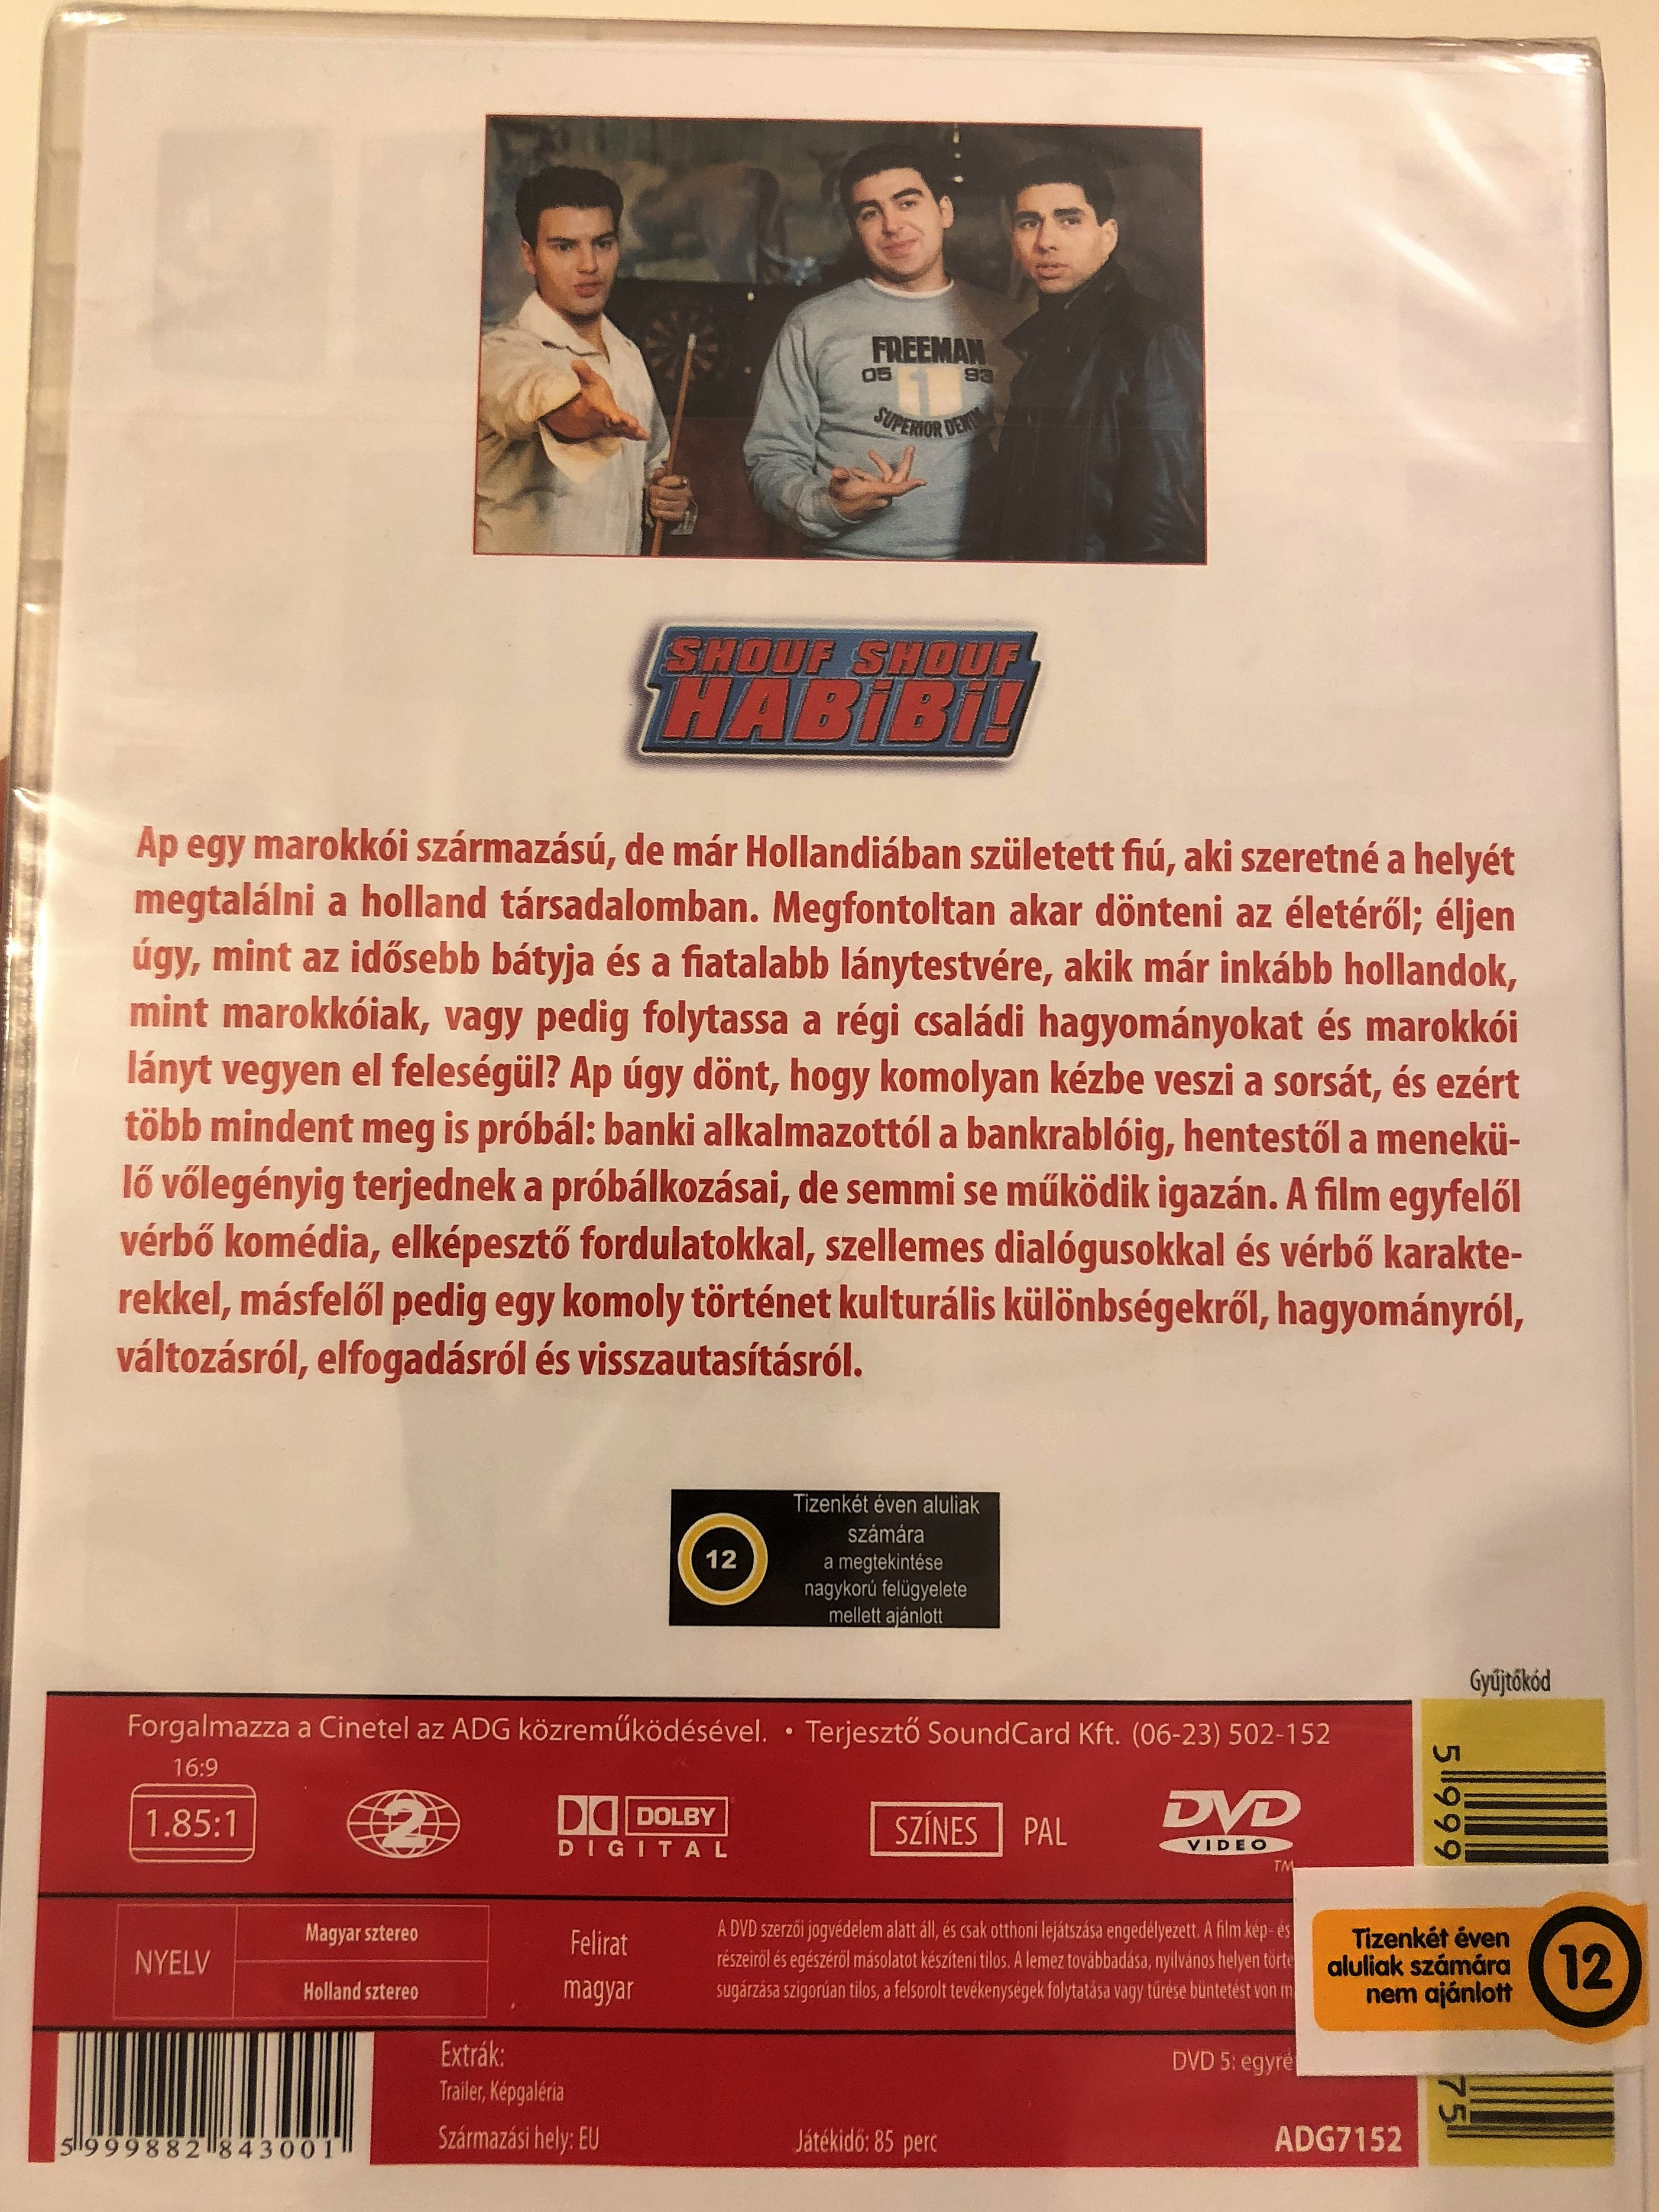 shouf-shouf-habibi-dvd-2004-hush-hush-baby-directed-by-albert-ter-heerdt-starring-mimoun-oa-ssa-salah-eddine-benmoussa-2-.jpg